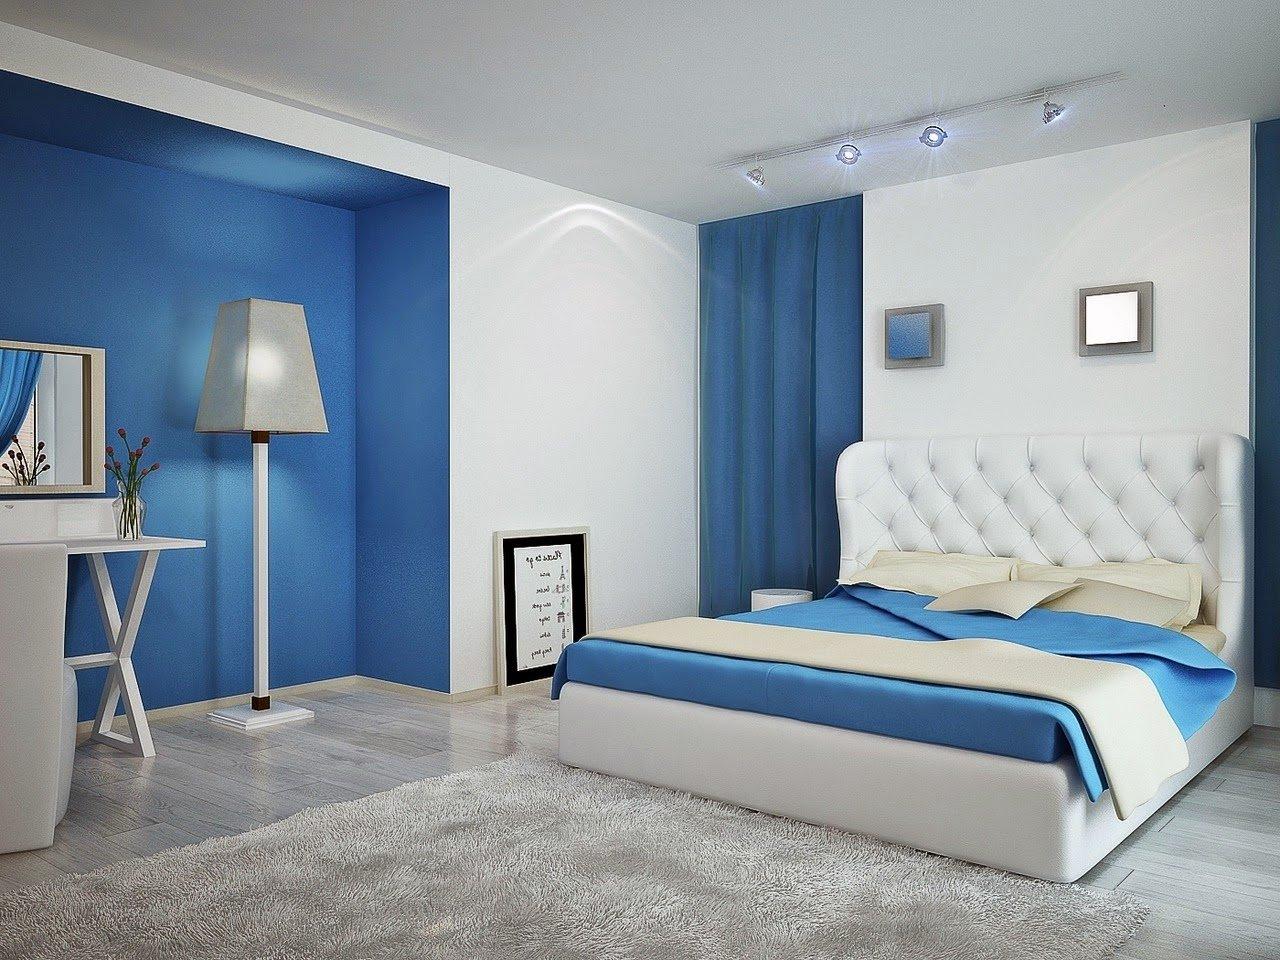 10 Stylish Blue And White Bedroom Ideas master bedroom ideas blue and white get more decorating ideas 2020